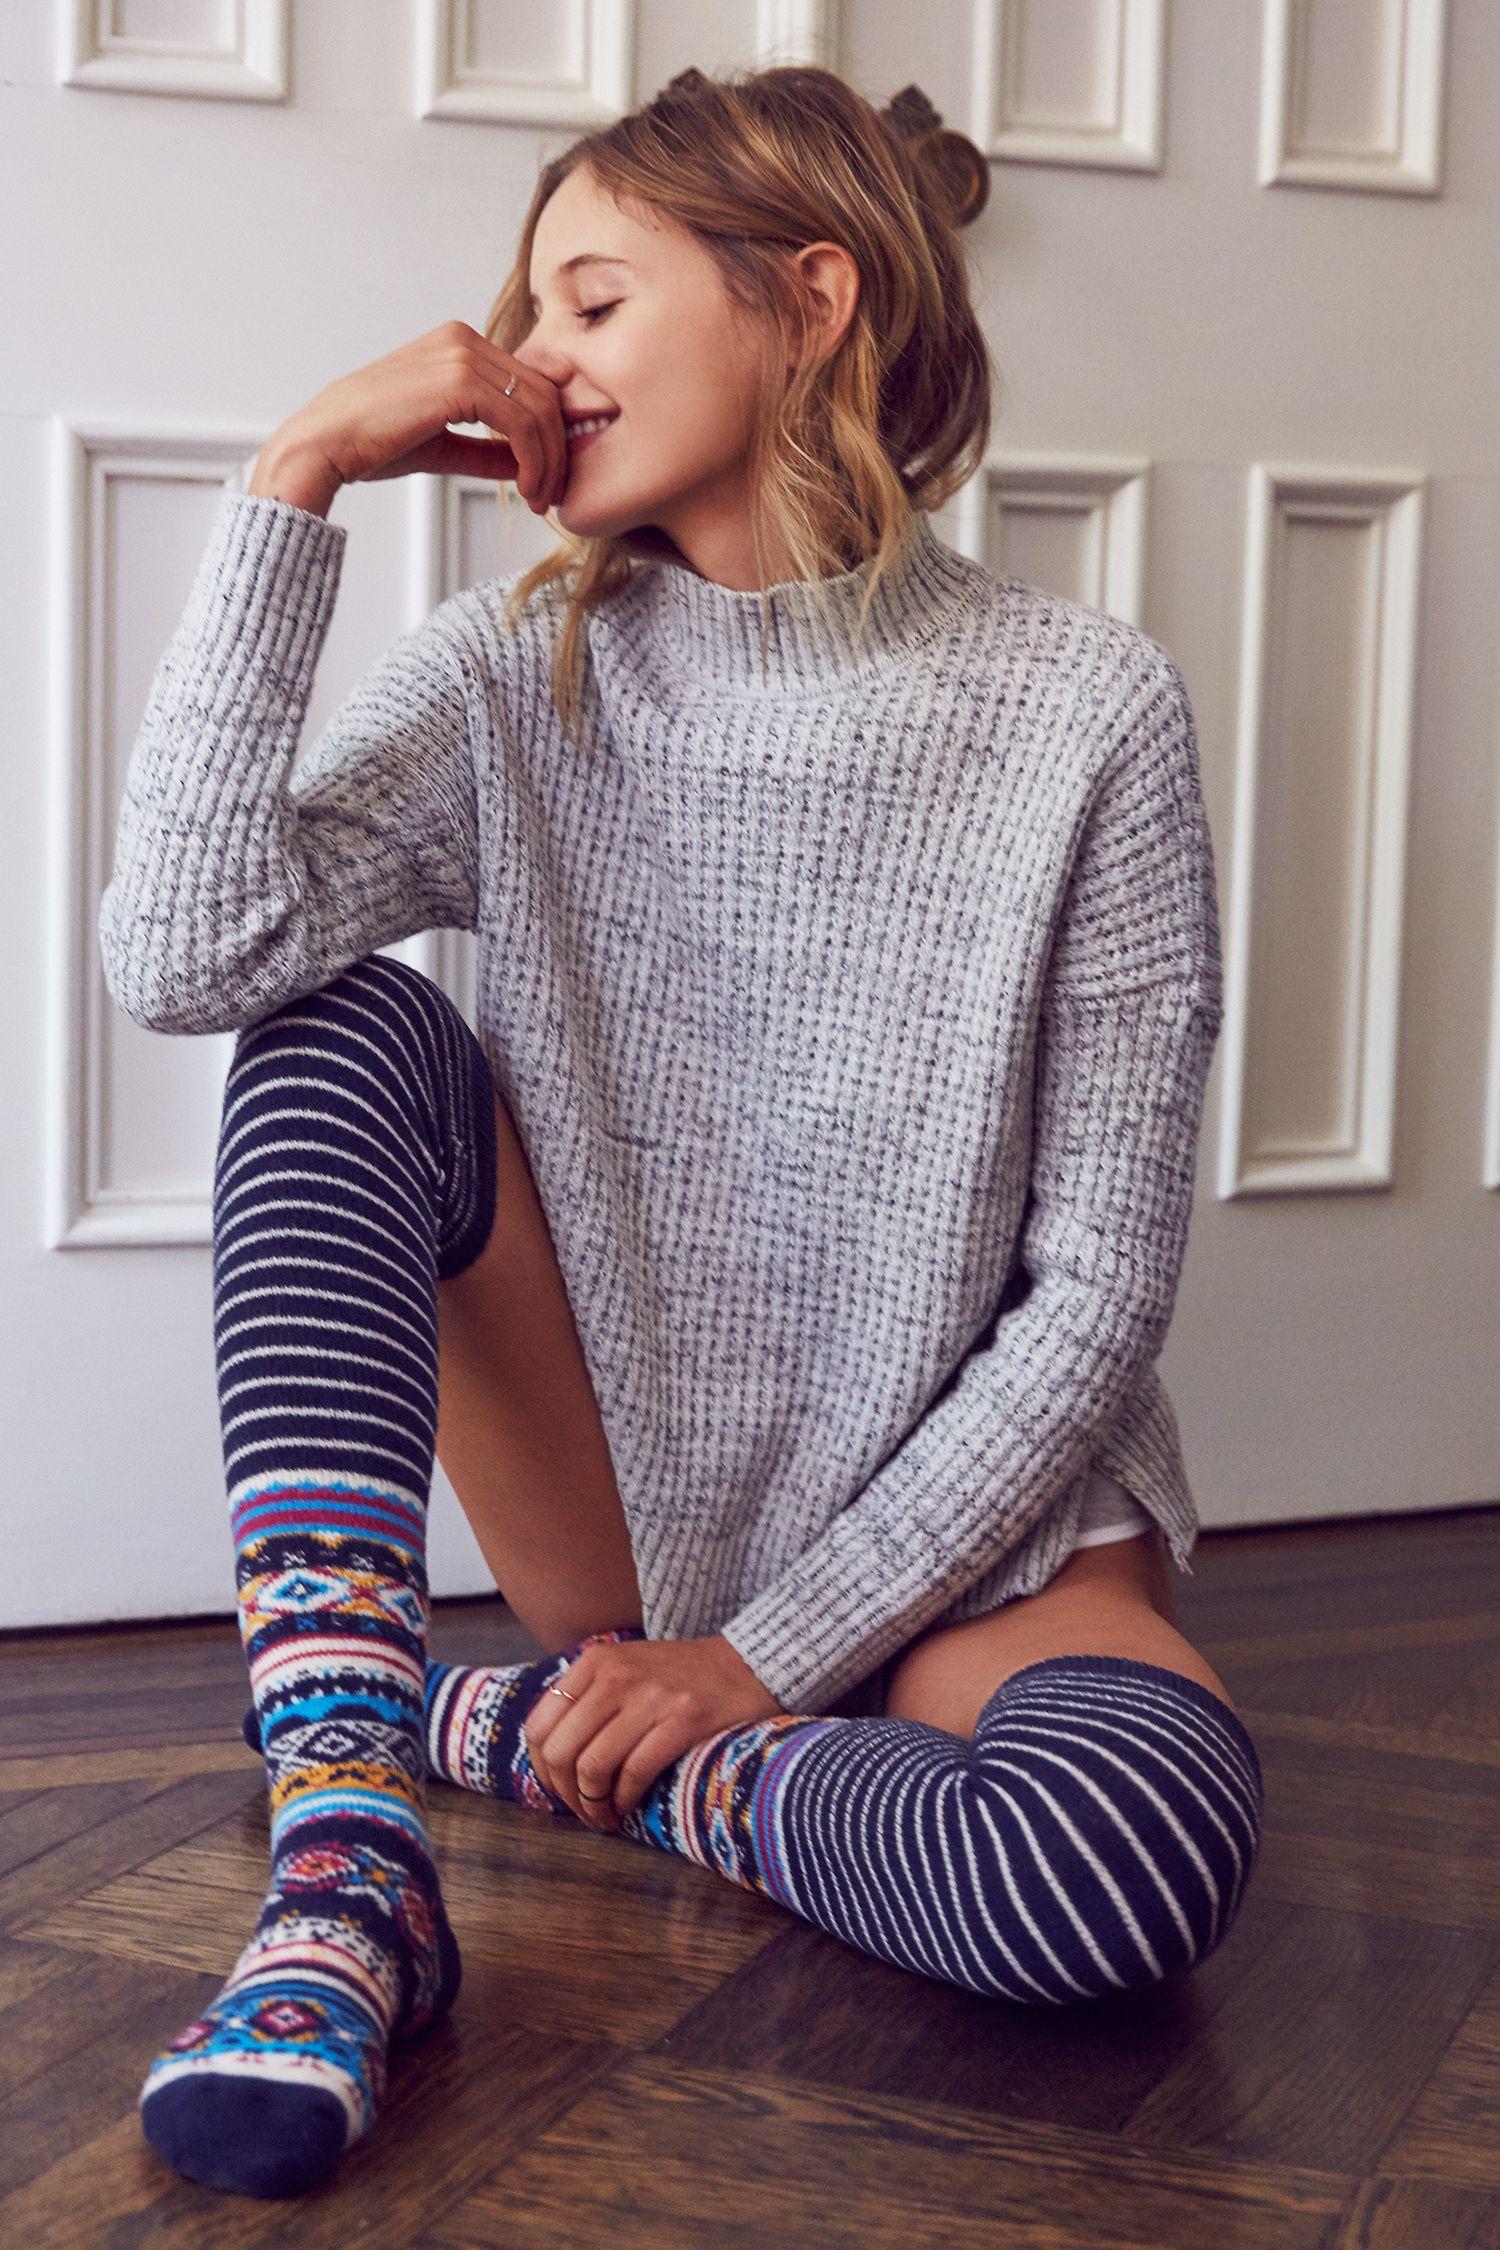 Pinterest Beautyintheknow  Ropa, Outfits 90S, Ropa Femenina-5303